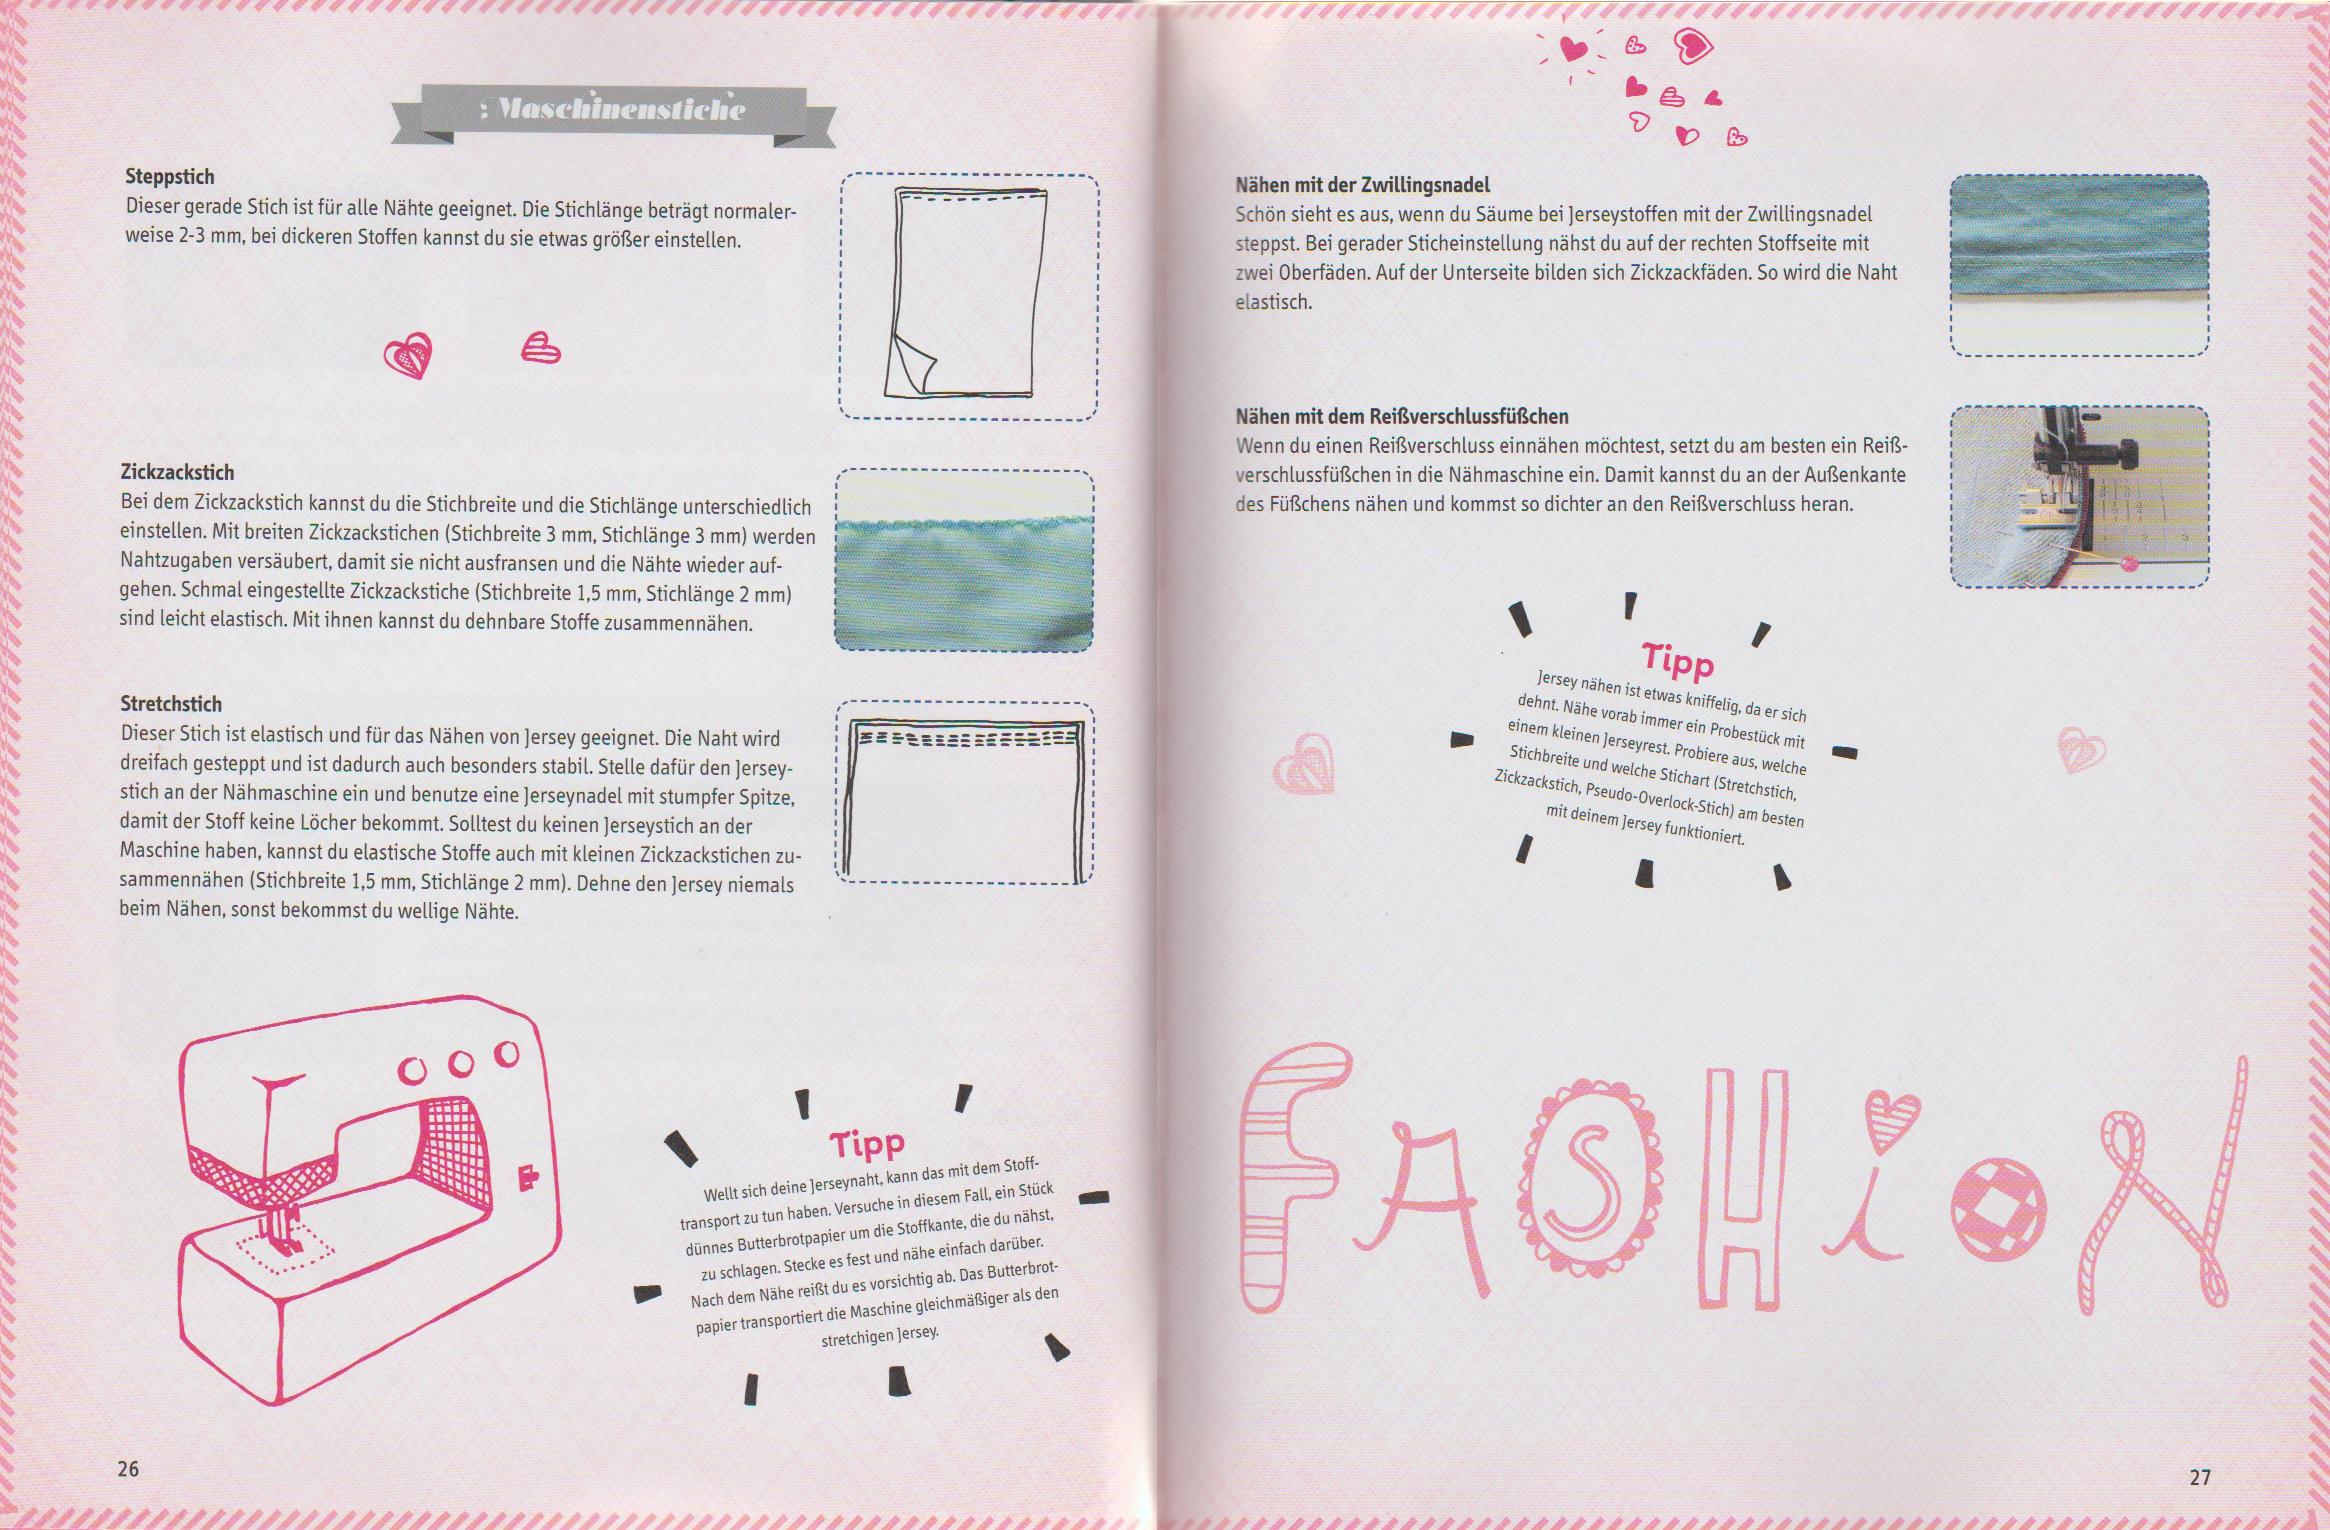 frechverlag_fashionbuch_fj15_02.jpg